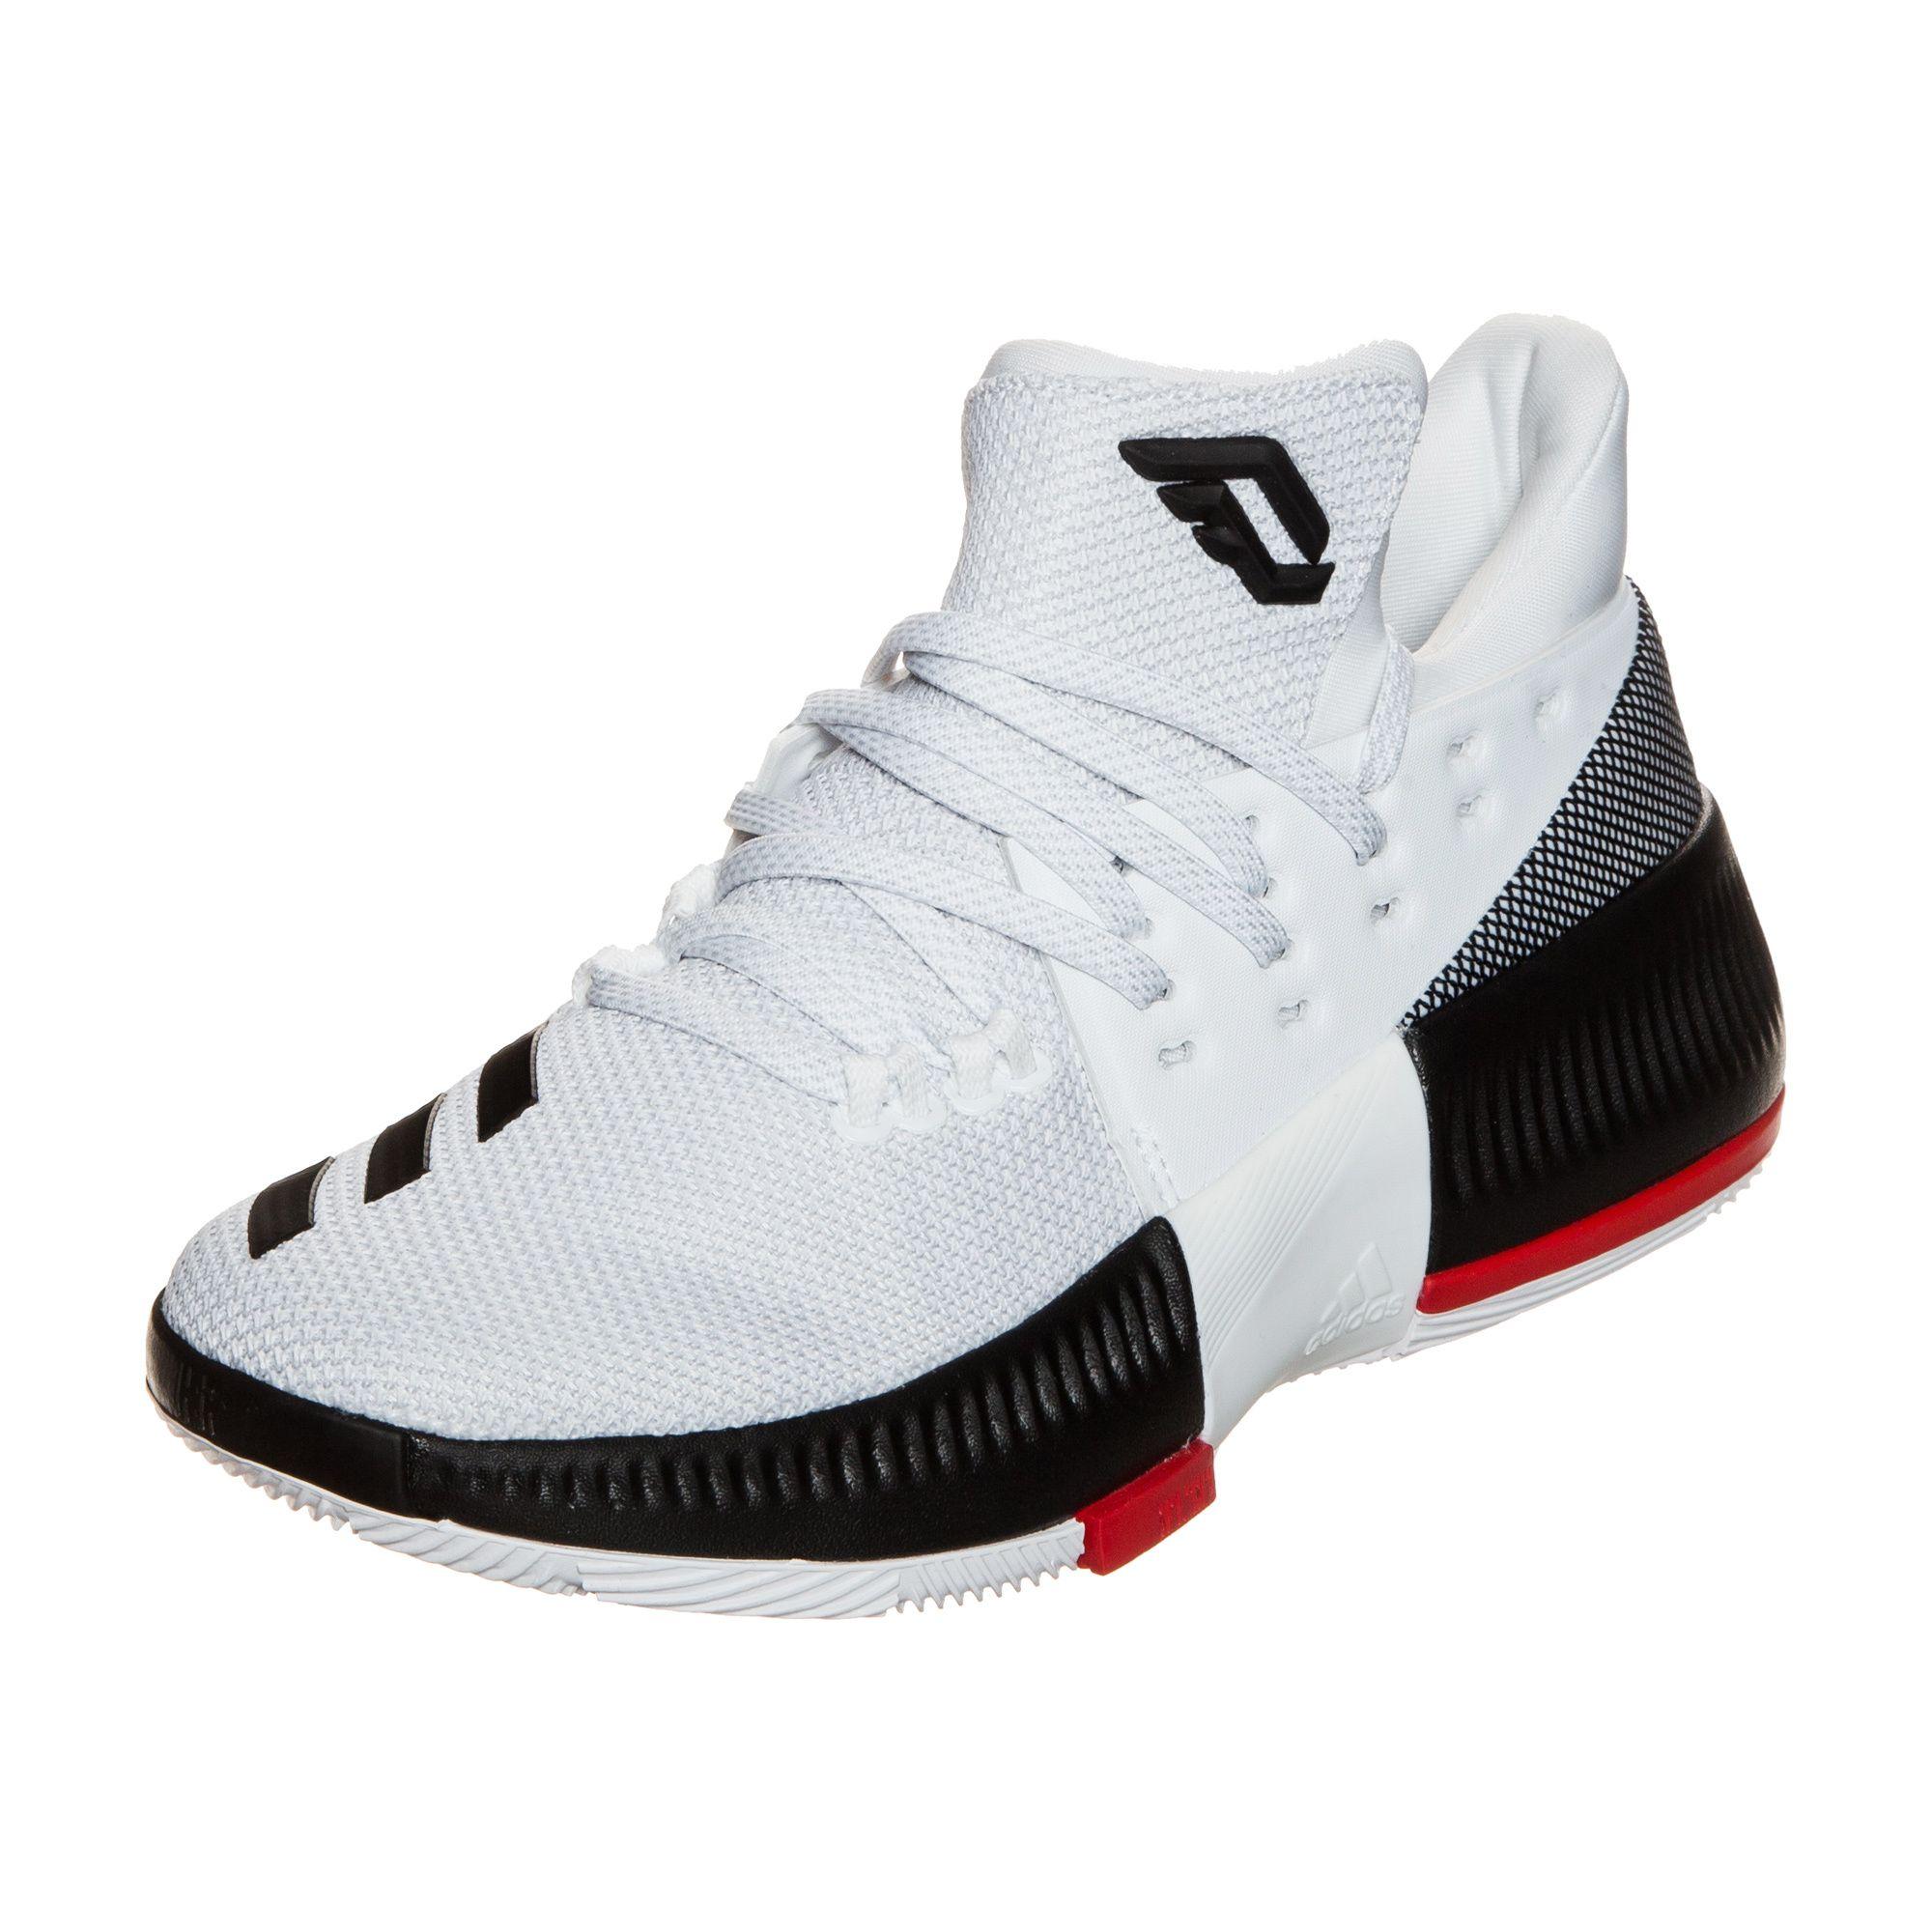 ADIDAS PERFORMANCE adidas Performance Dame 3 Basketballschuh Kinder